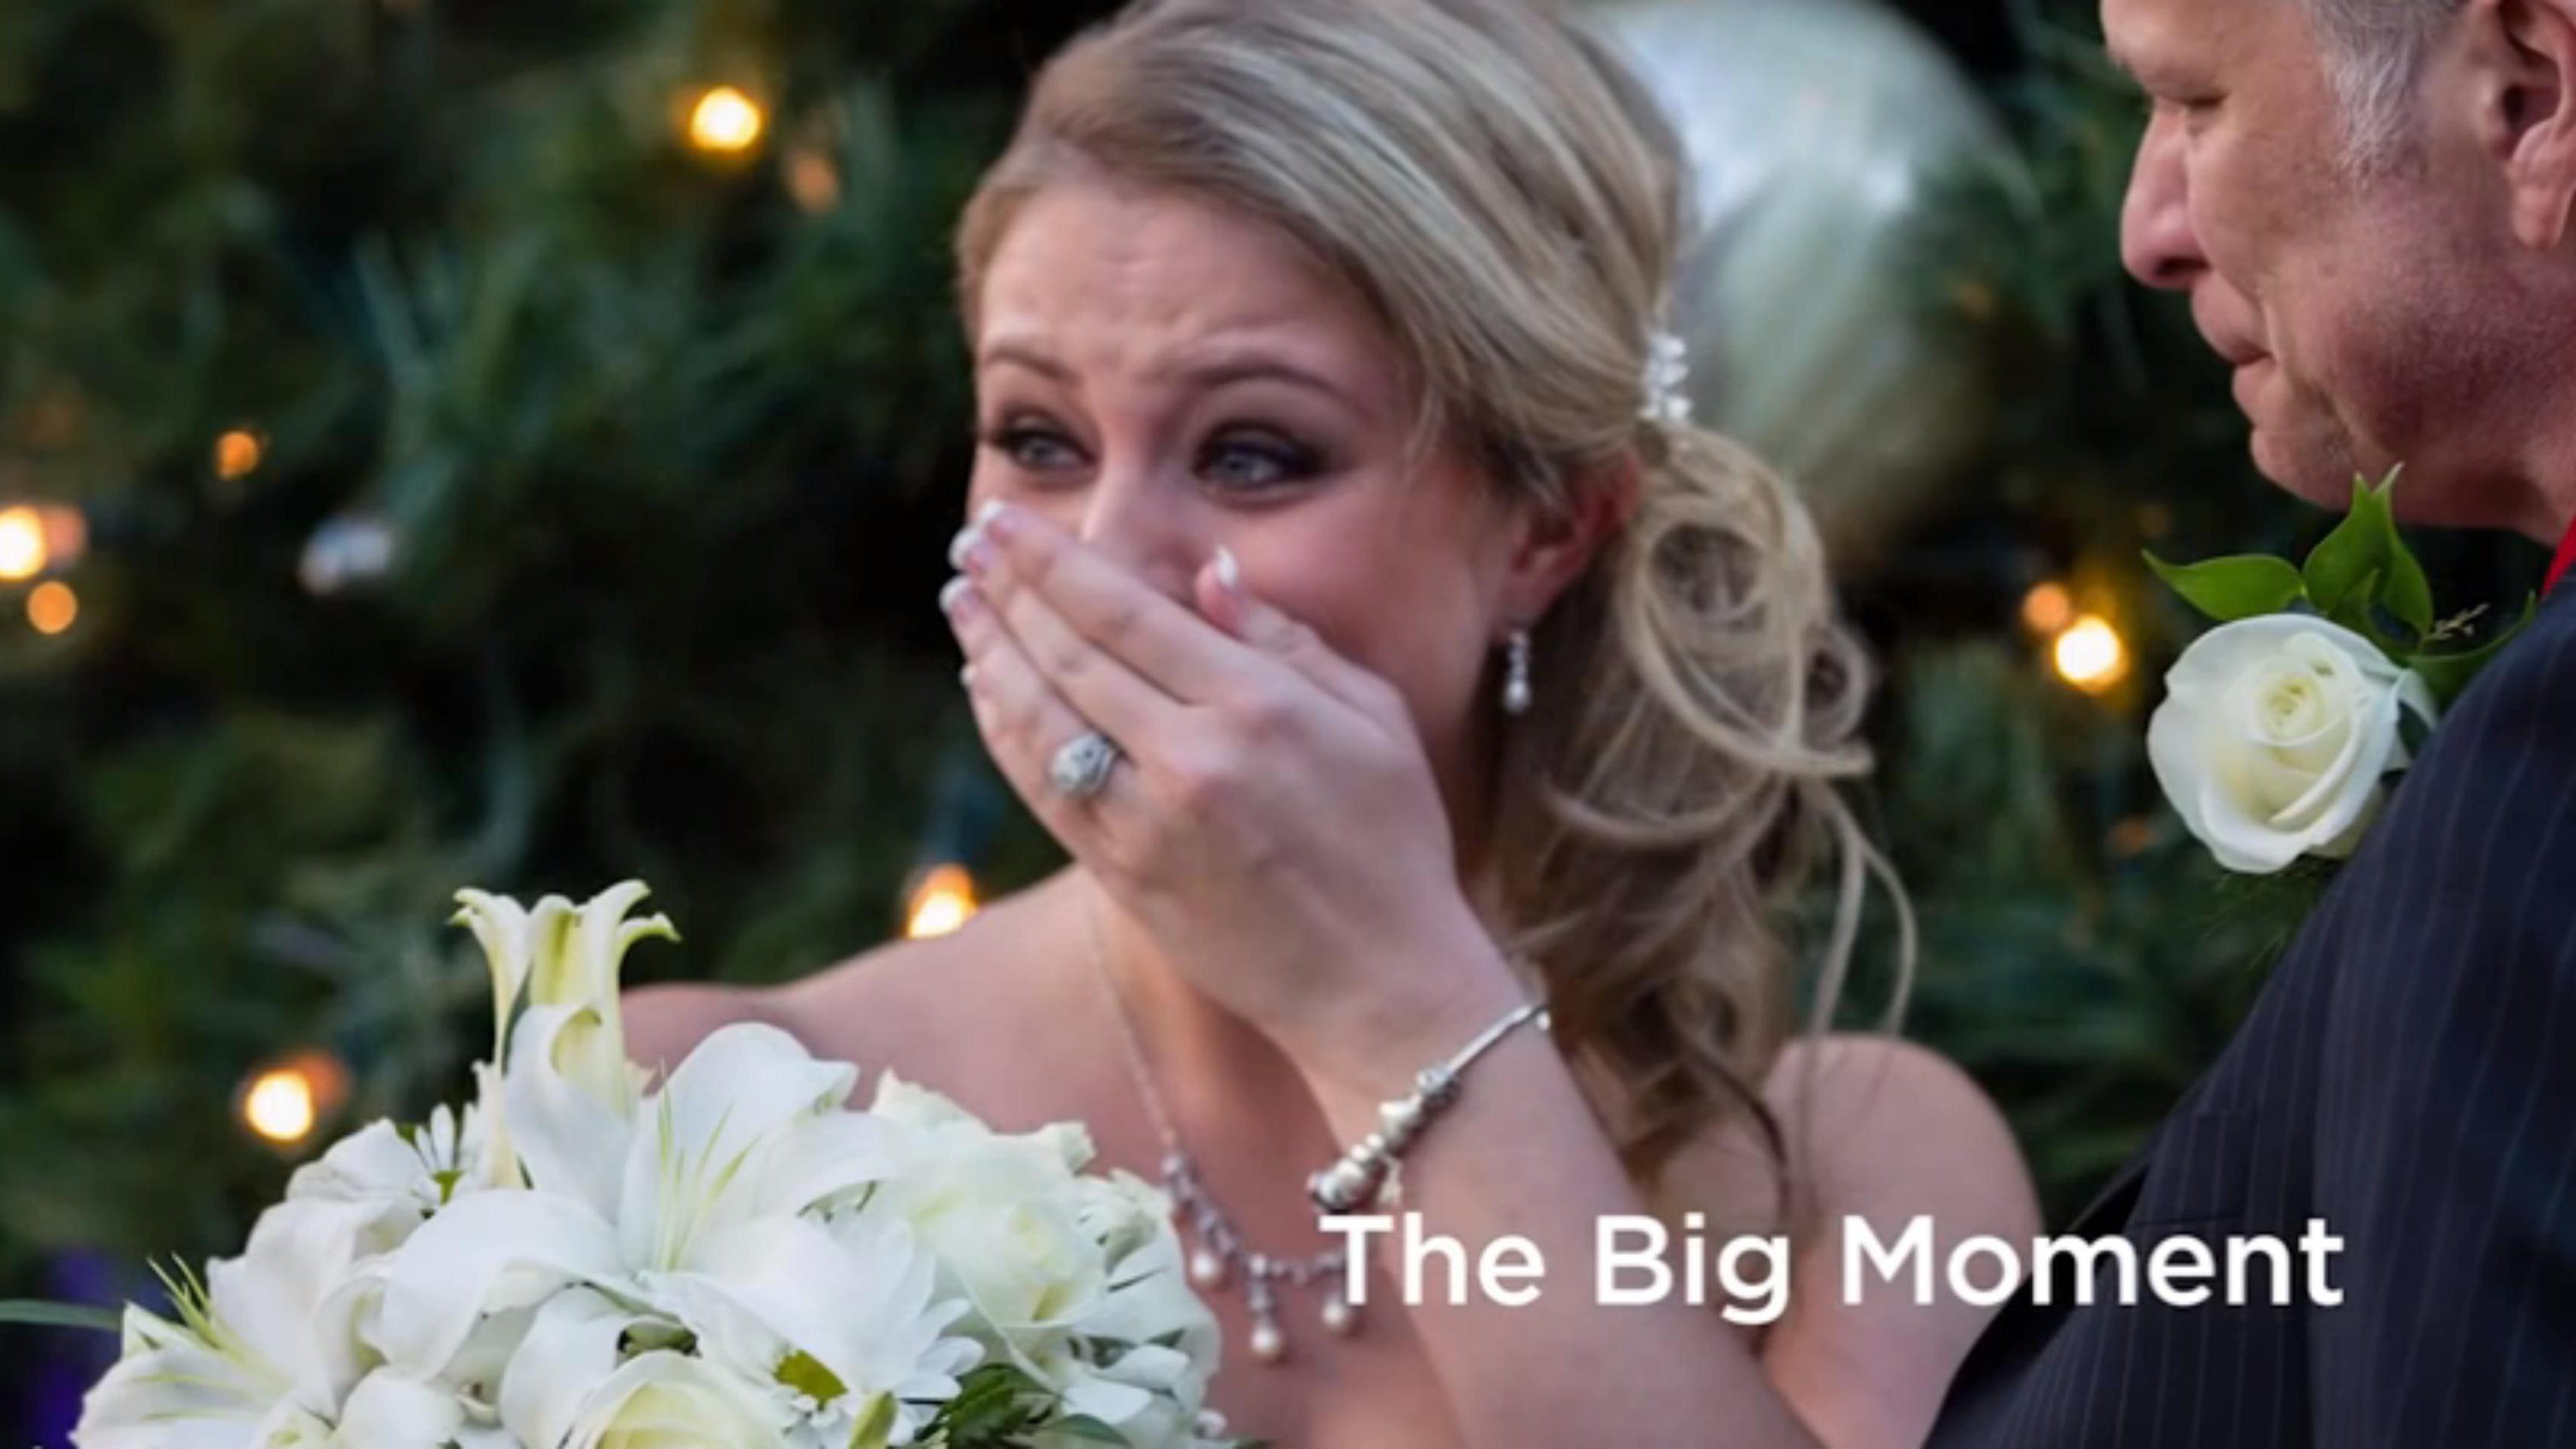 Groom throws surprise flash mob wedding for his bride